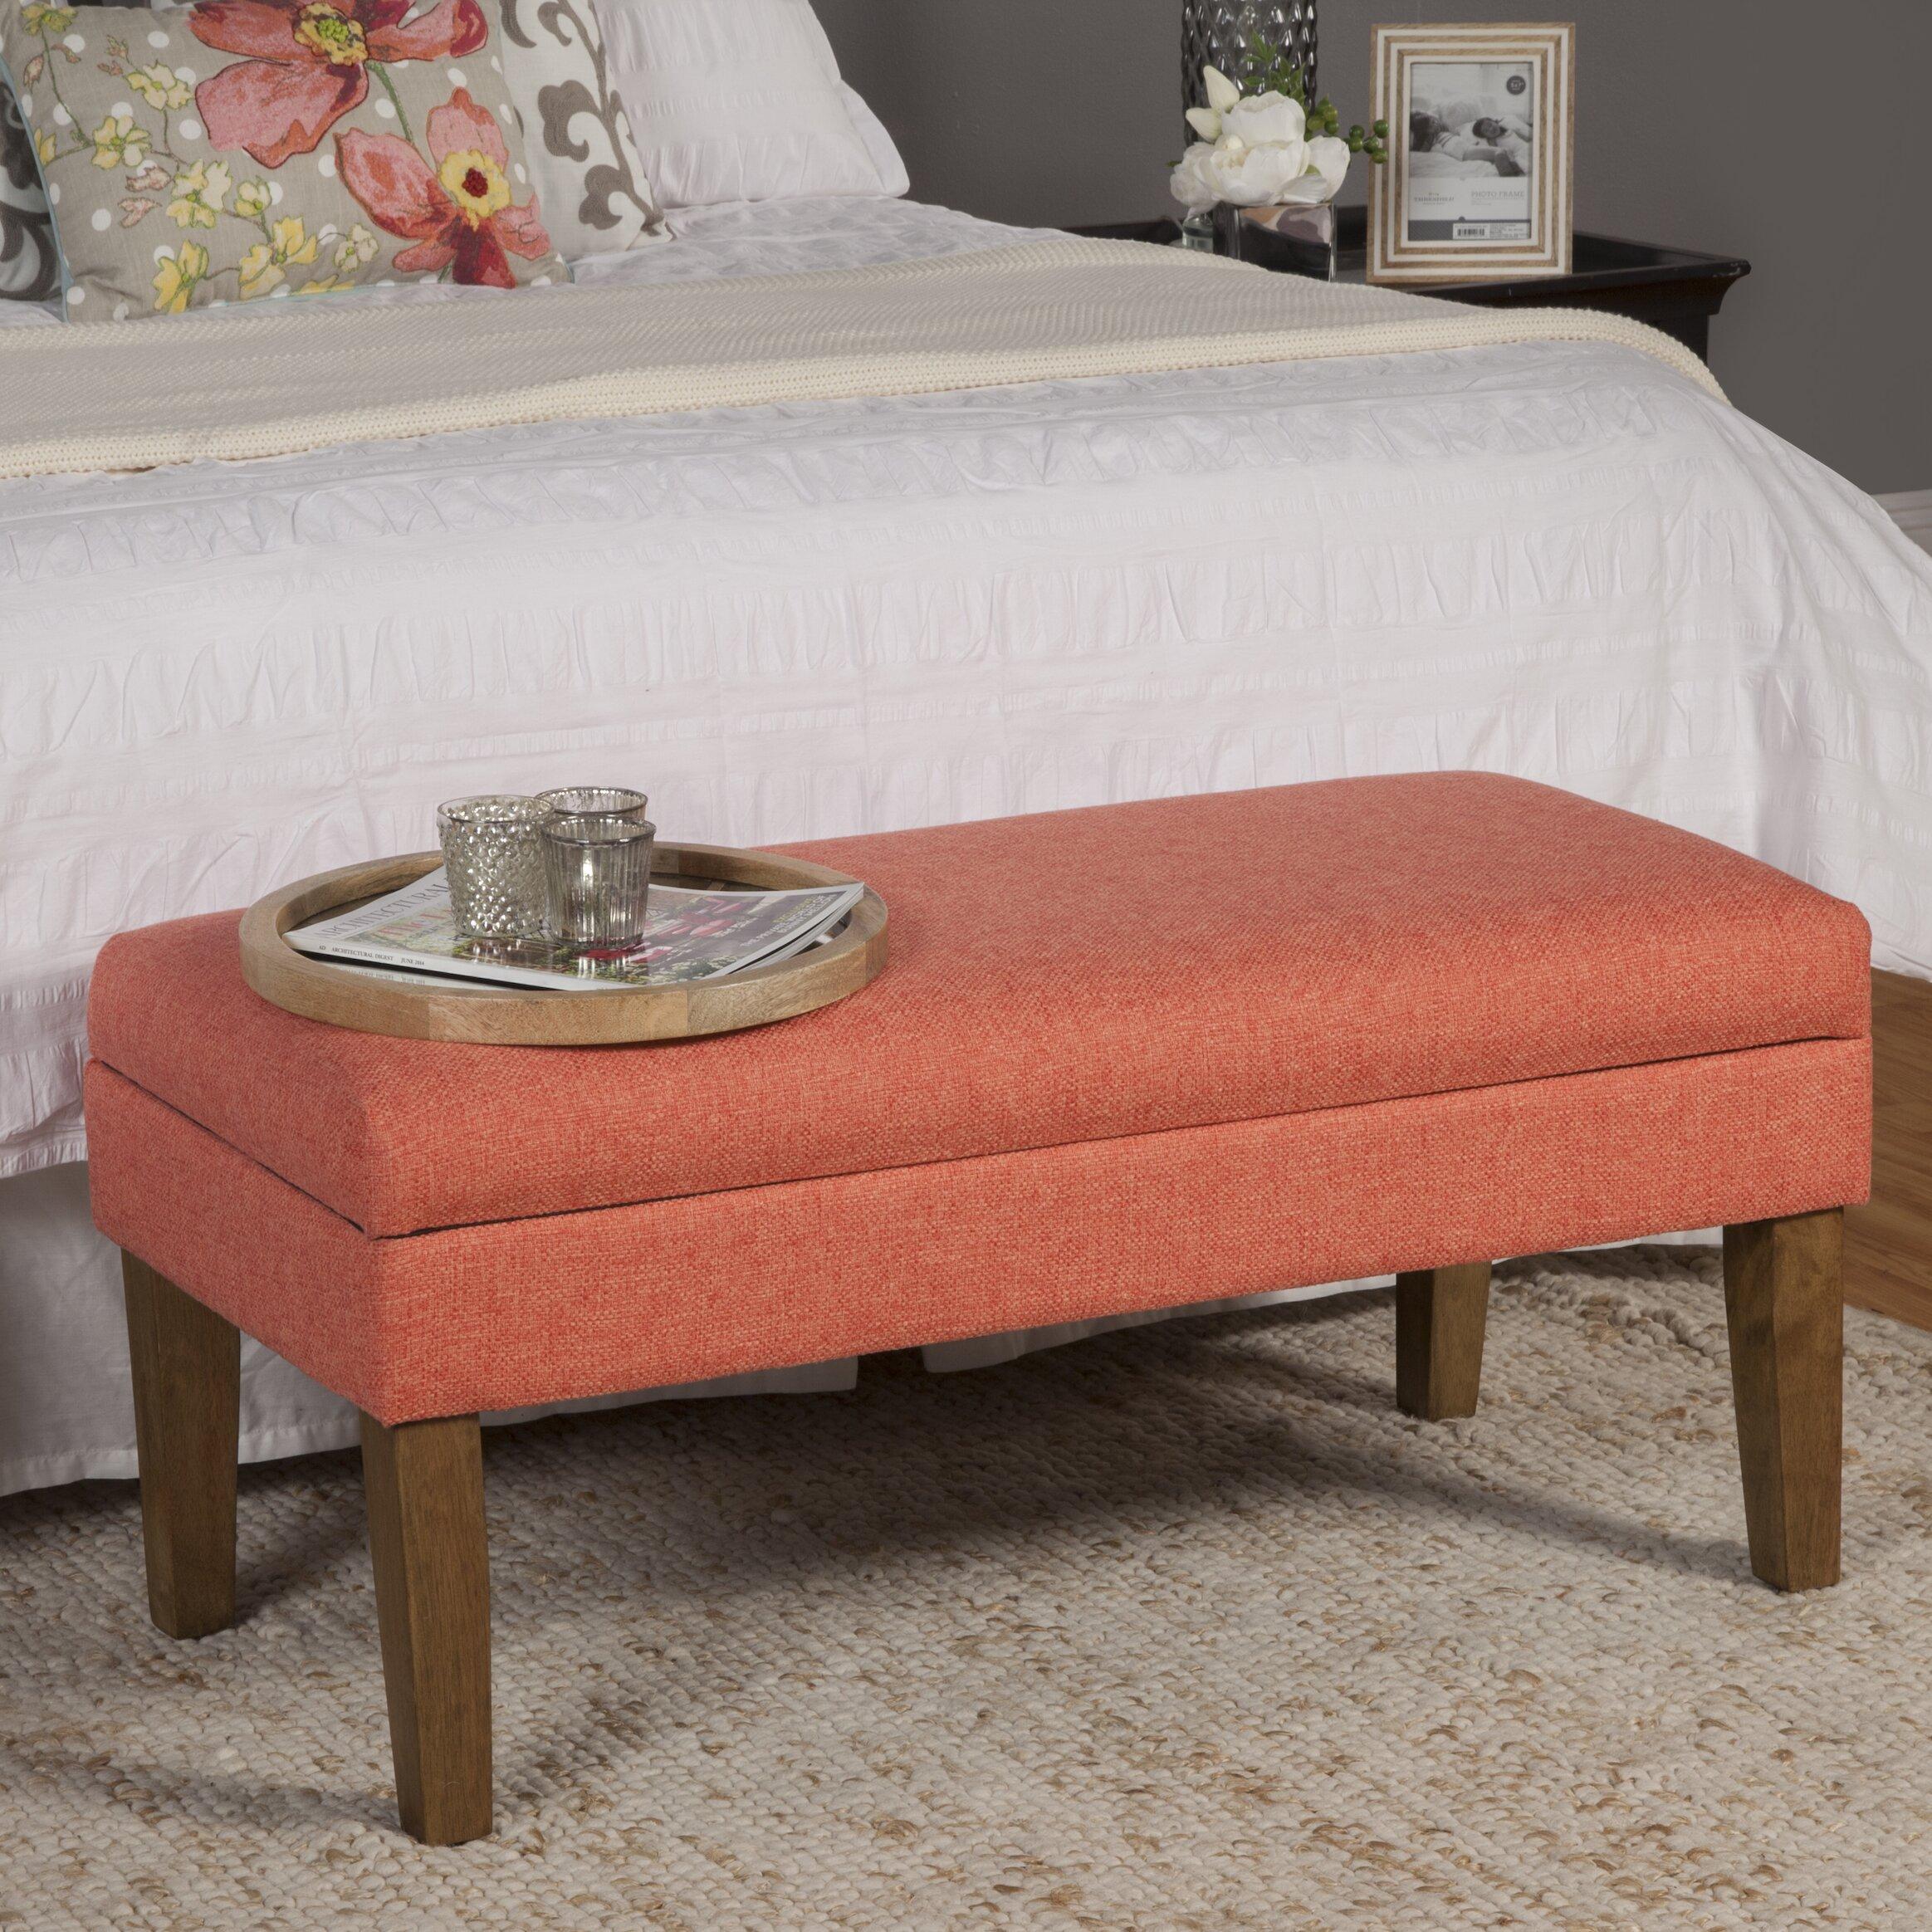 living room storage bench textured tan upholstered storage ottoman upholsteredbstoragebbenchbinbcanarybtangerine upholstered storage ottoman: storage bench for living room